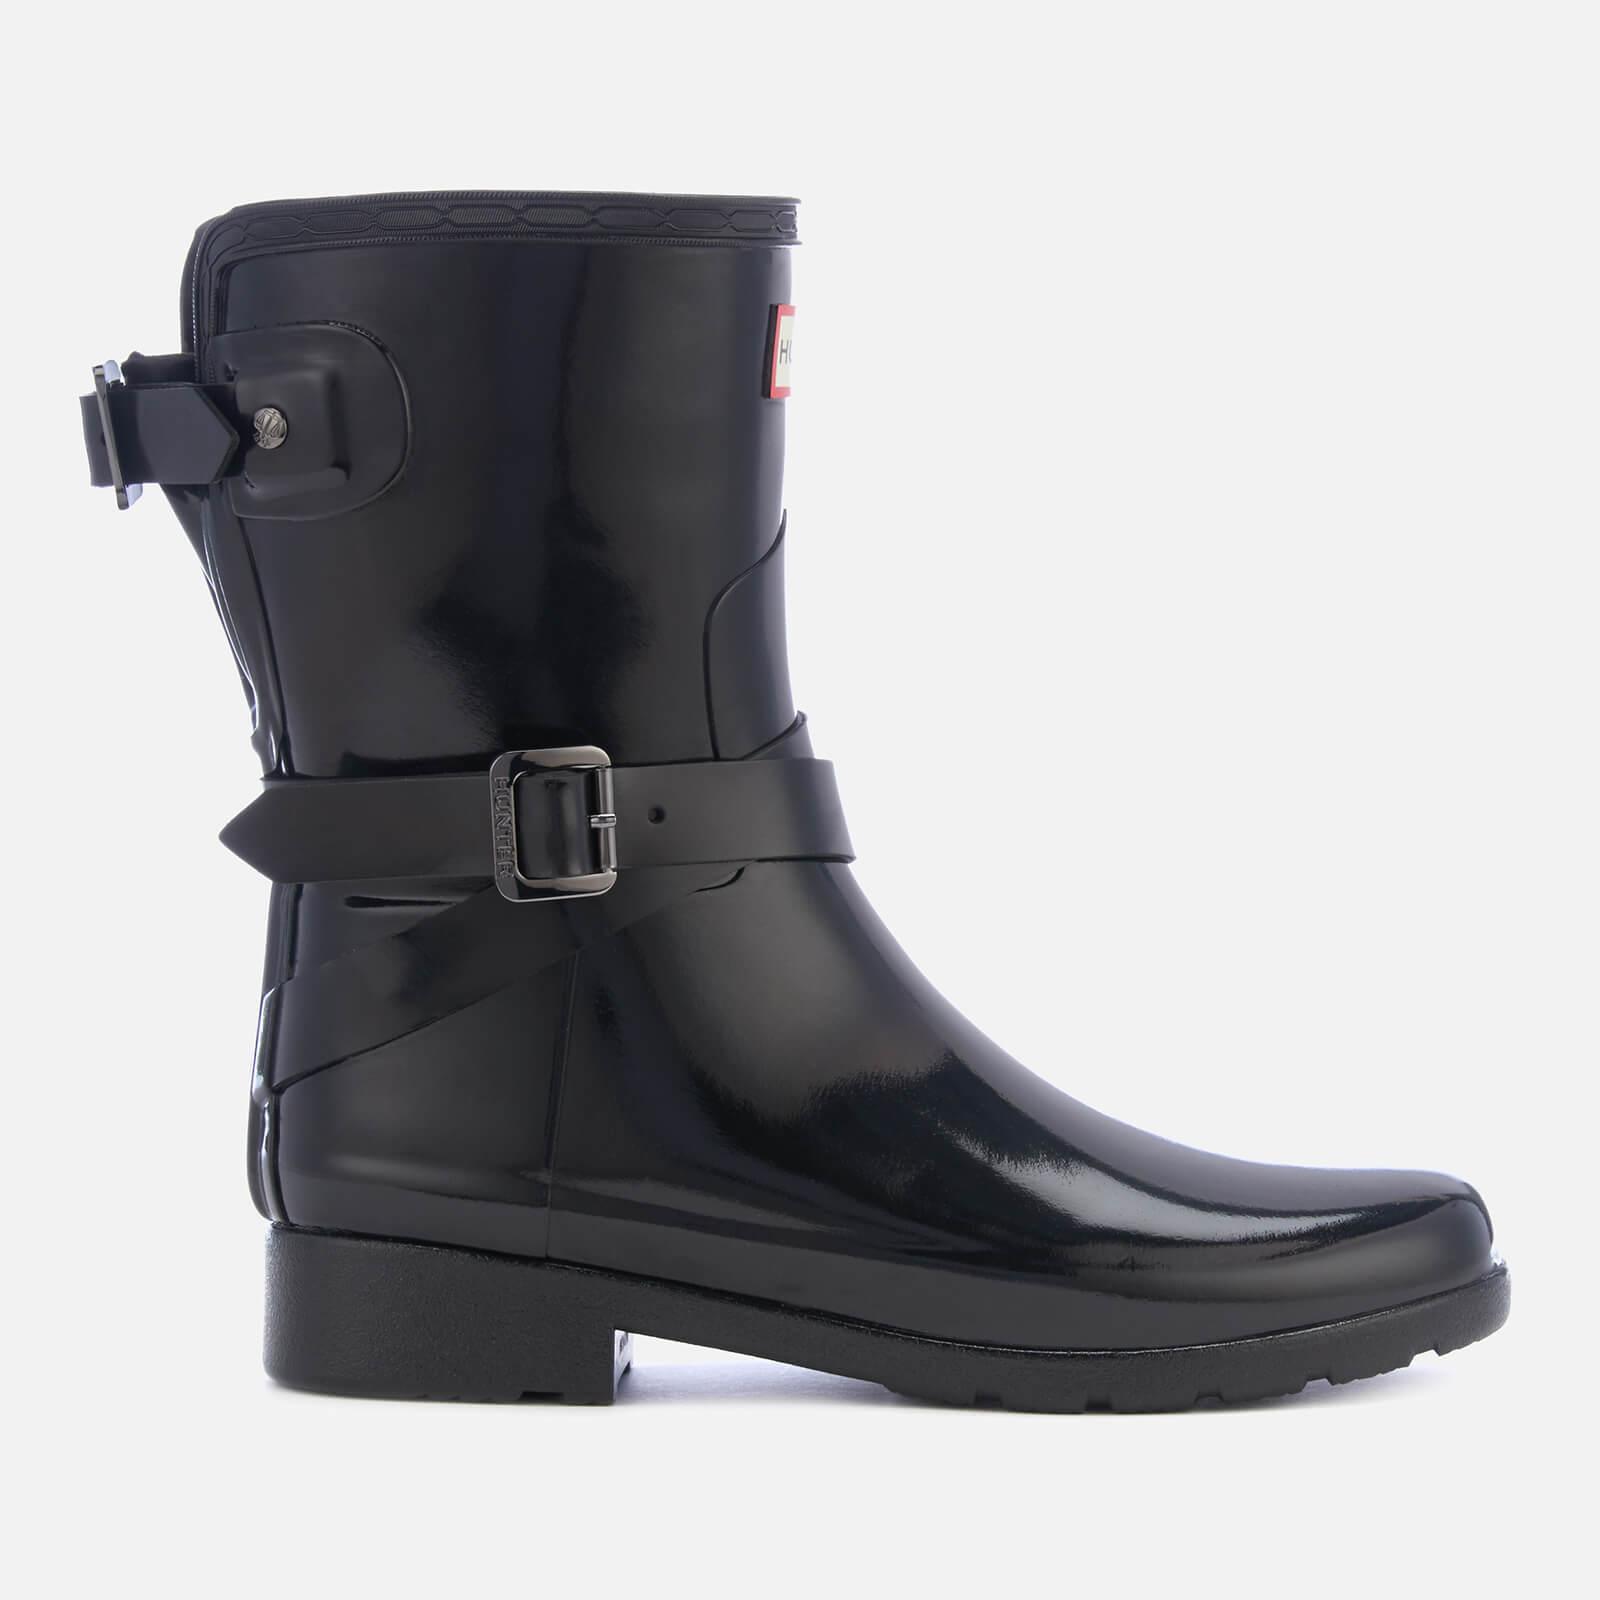 Hunter Women's Refined Back Adjustable Gloss Short Wellies - Black - UK 3 - Black